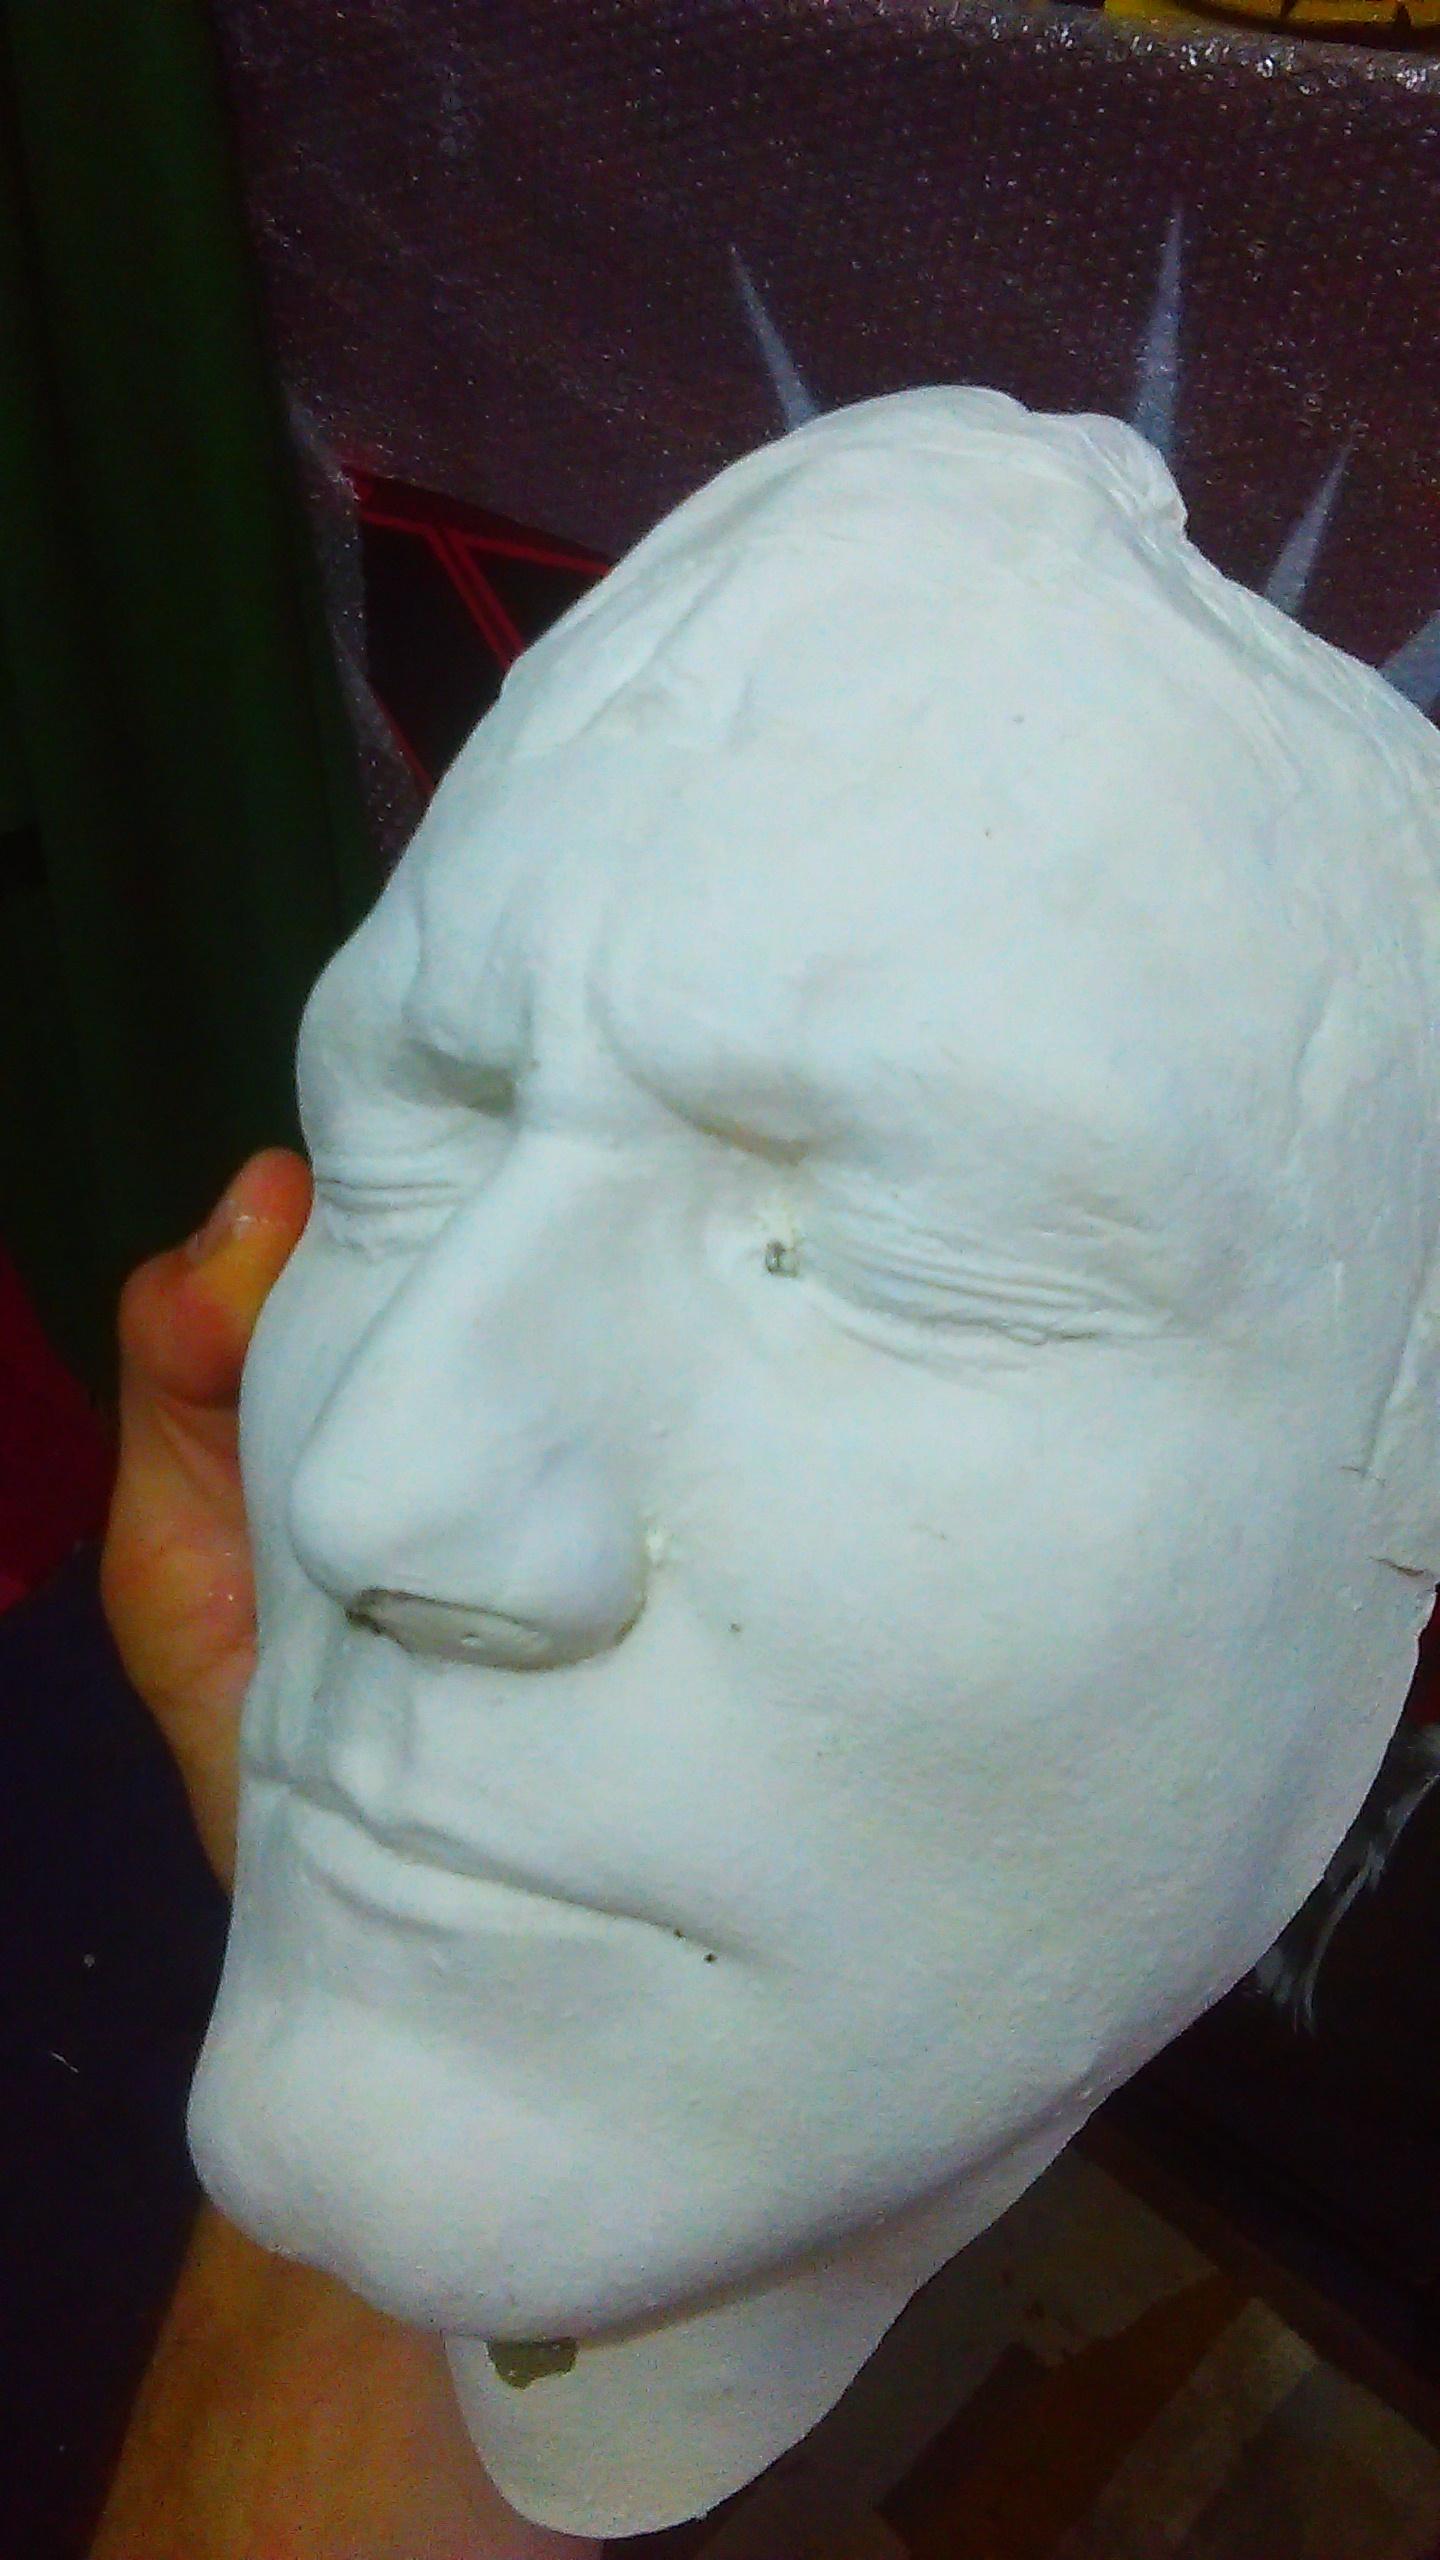 Void One - Plaster Casting